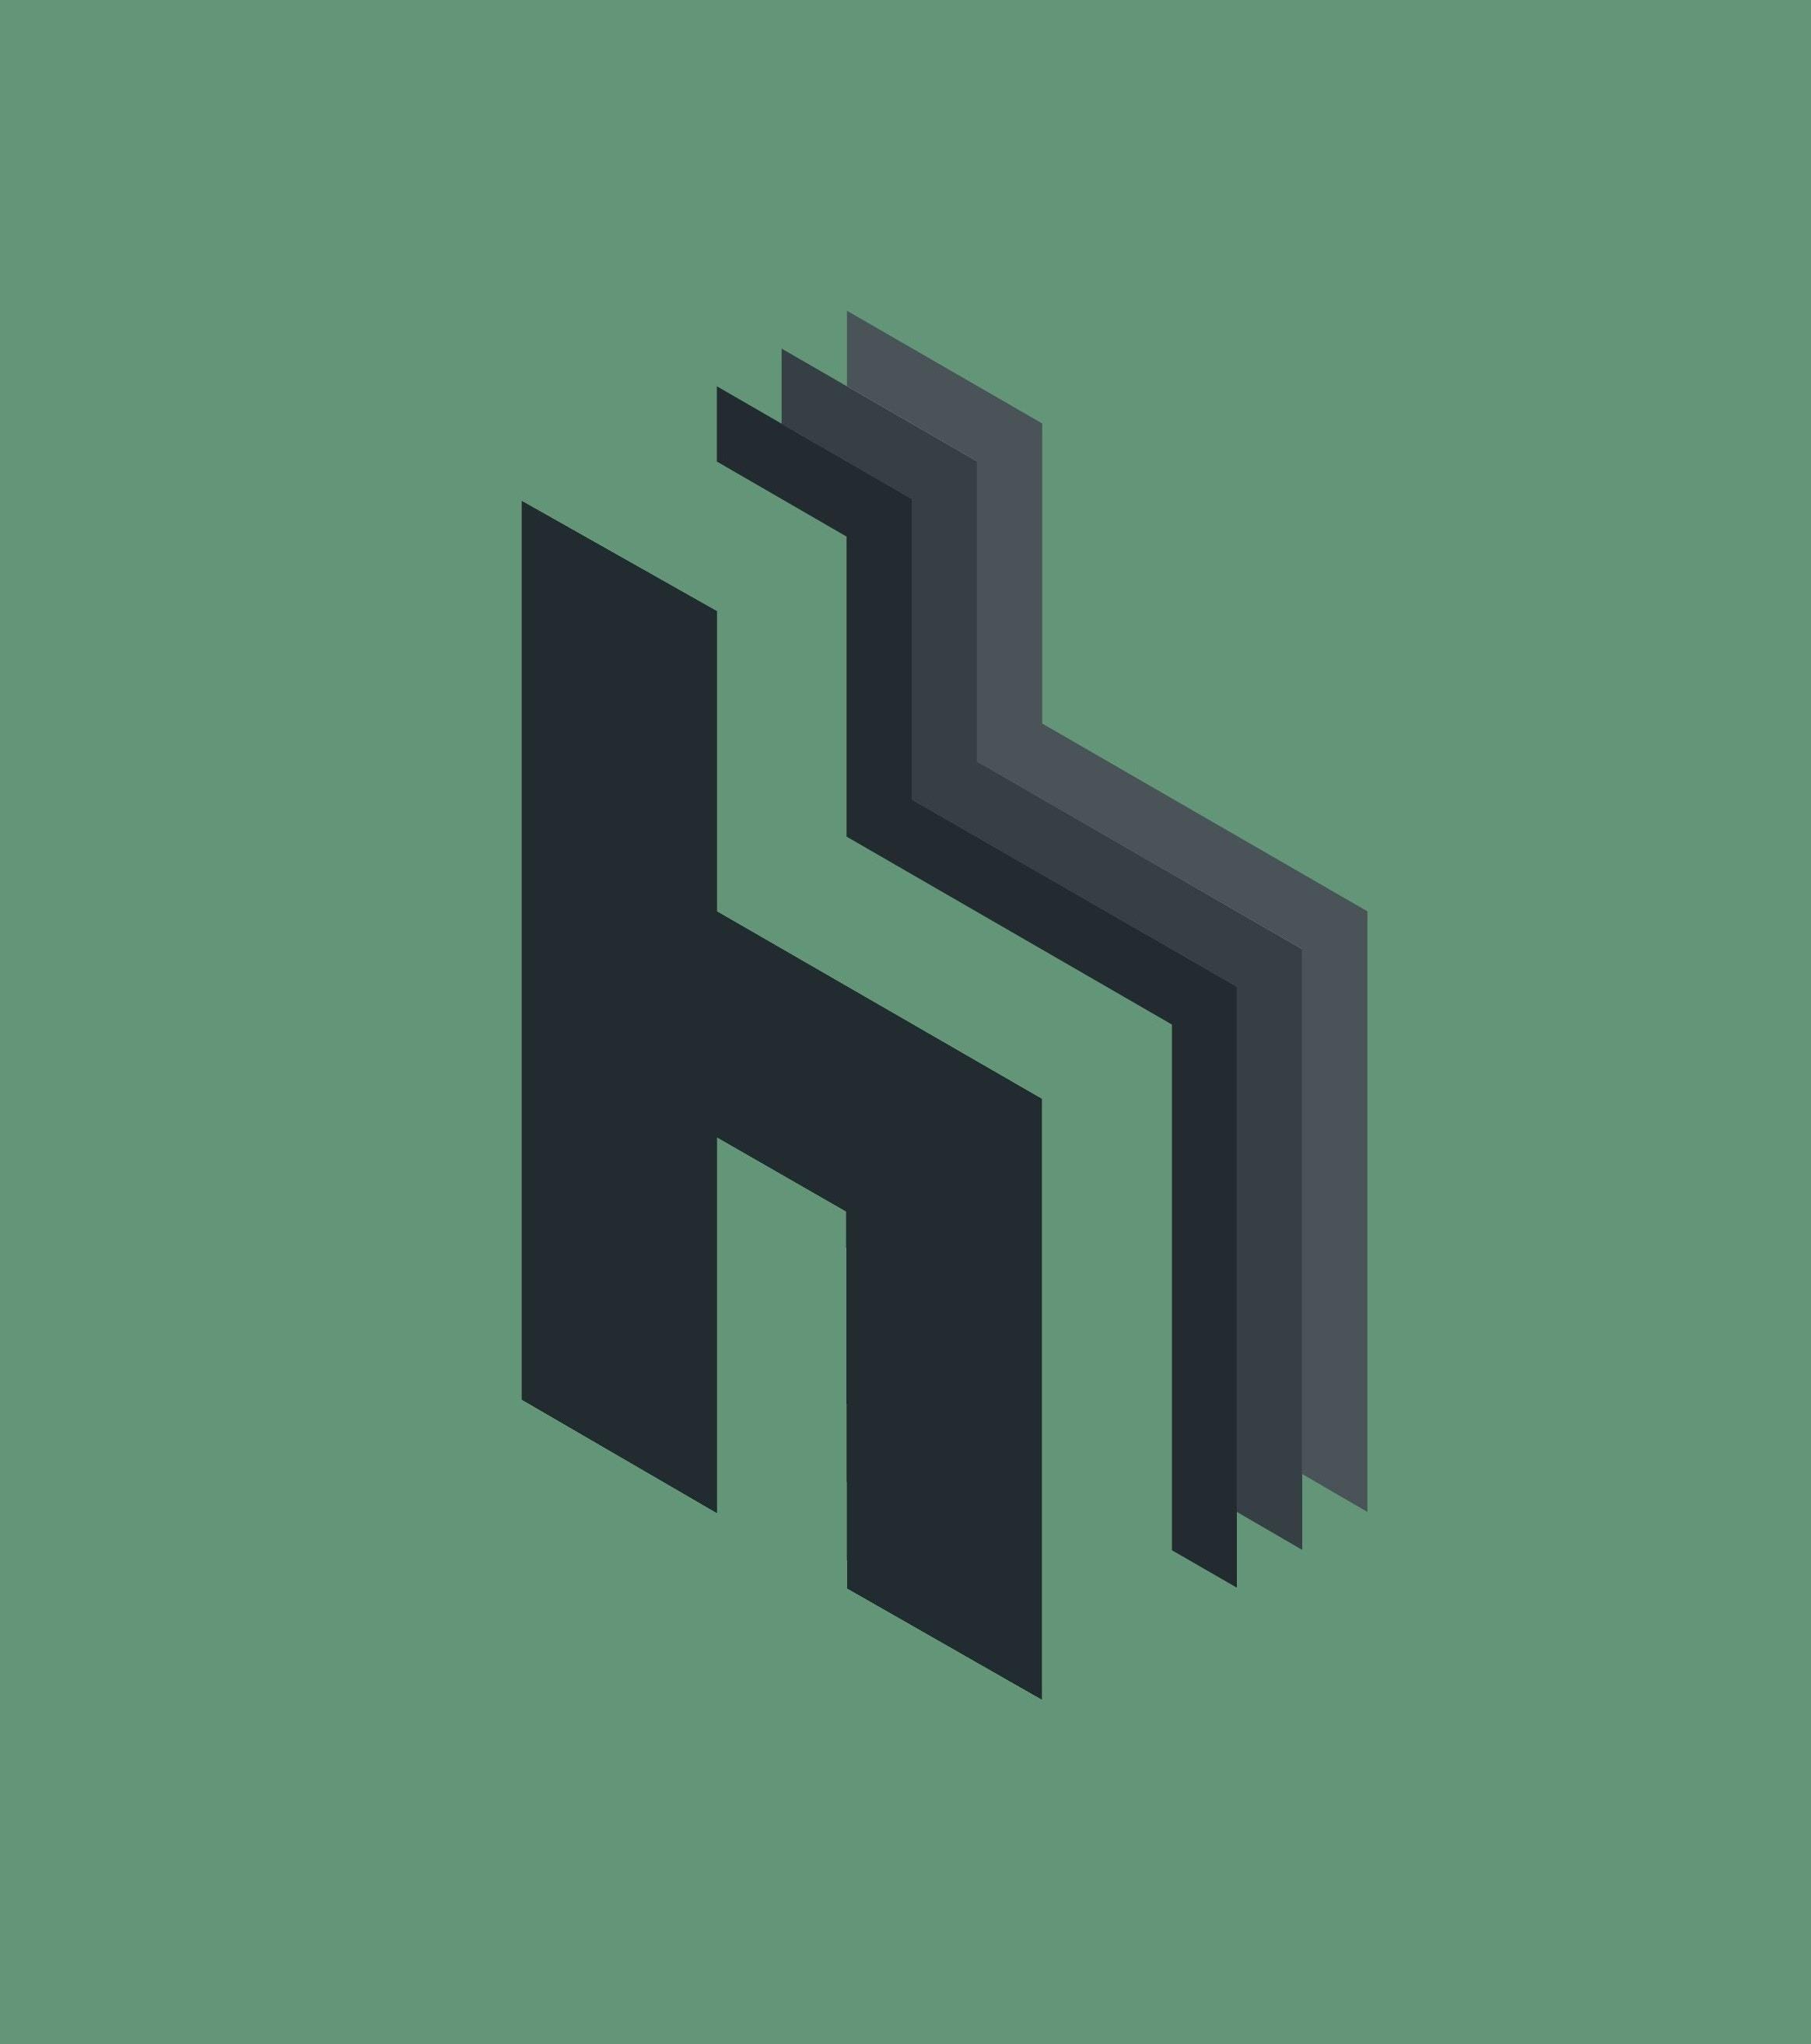 Go to hesro's profile